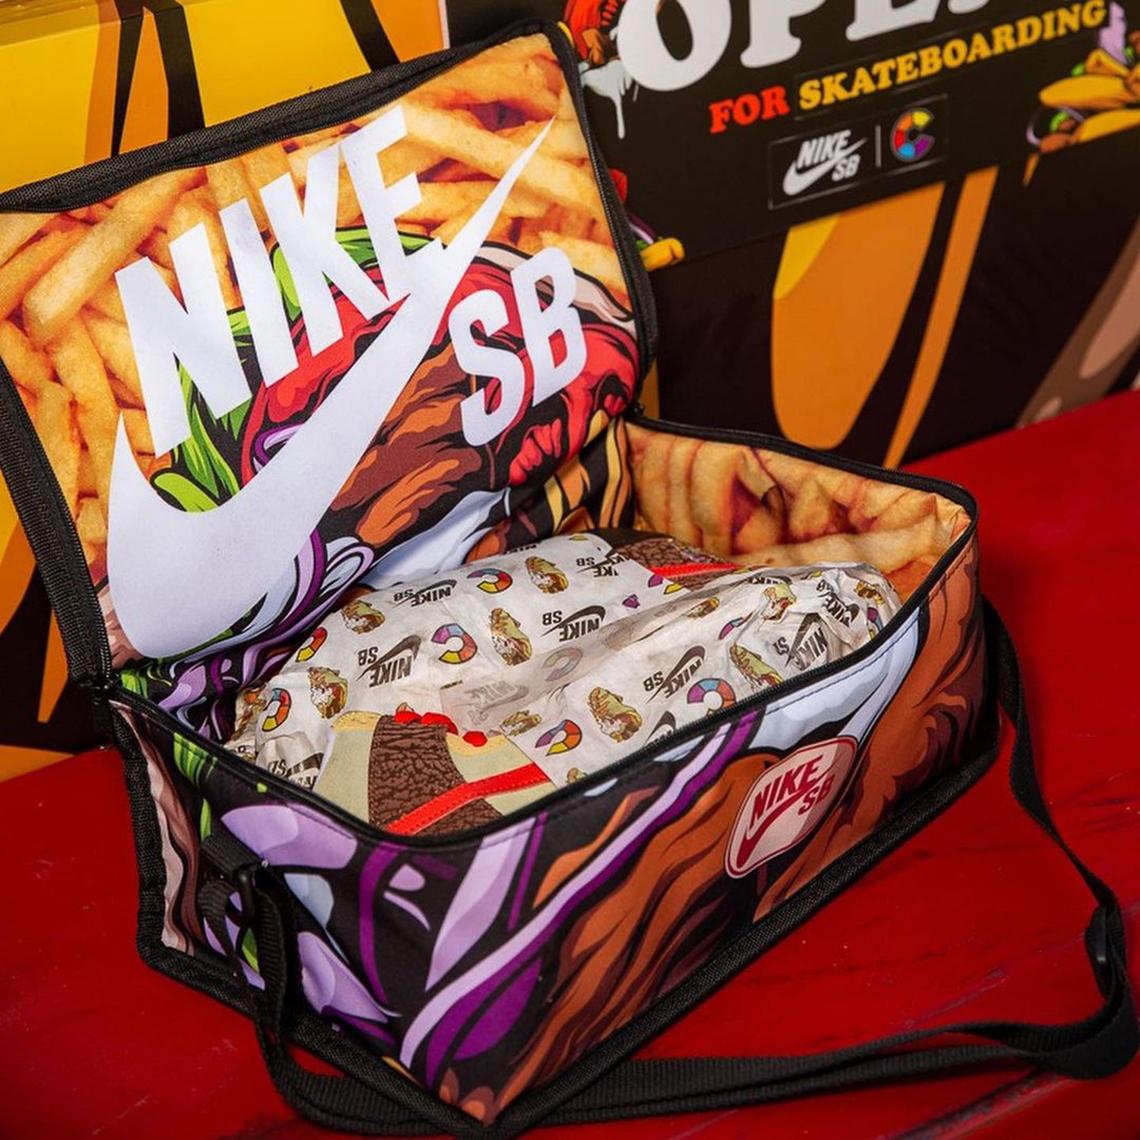 Colors-Nike-SB-Dunk-High-Kebab-and-Destroy-1.jpg?w=1140